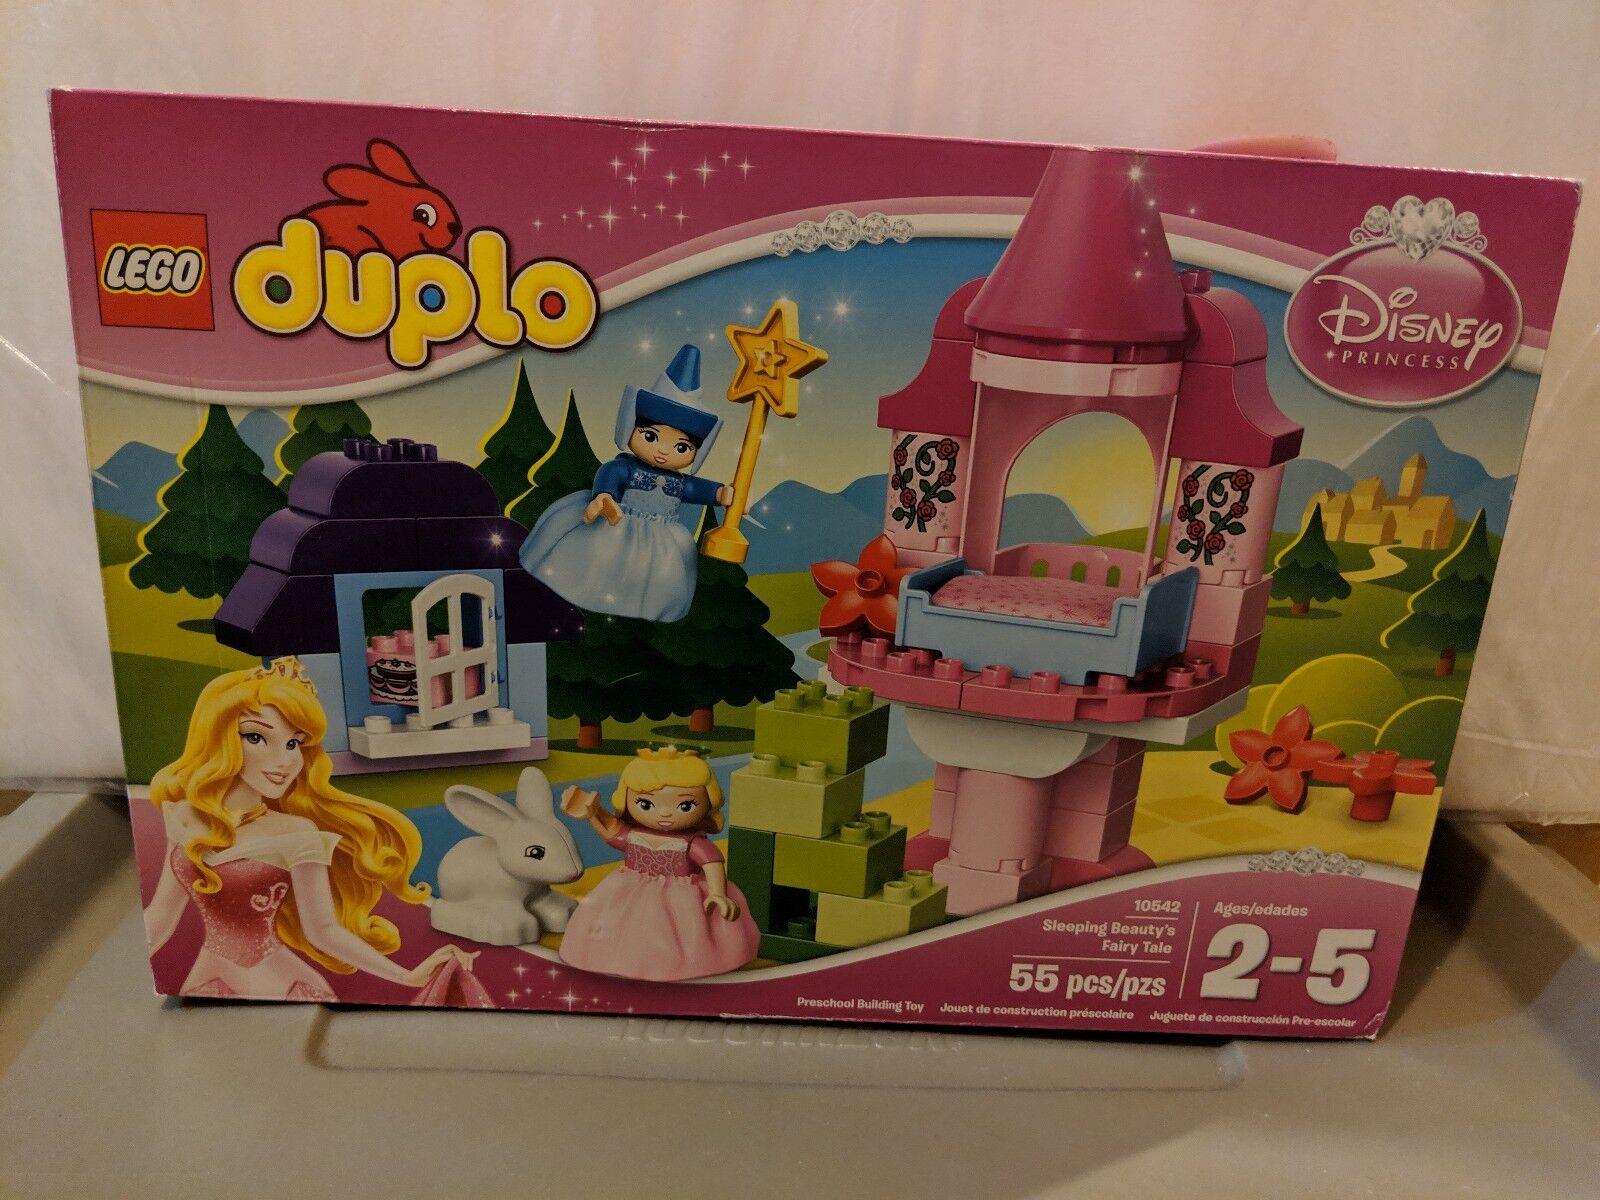 New in Sealed Box - Duplo - Lego 10542 Sleeping Beauty's Fairy Tale